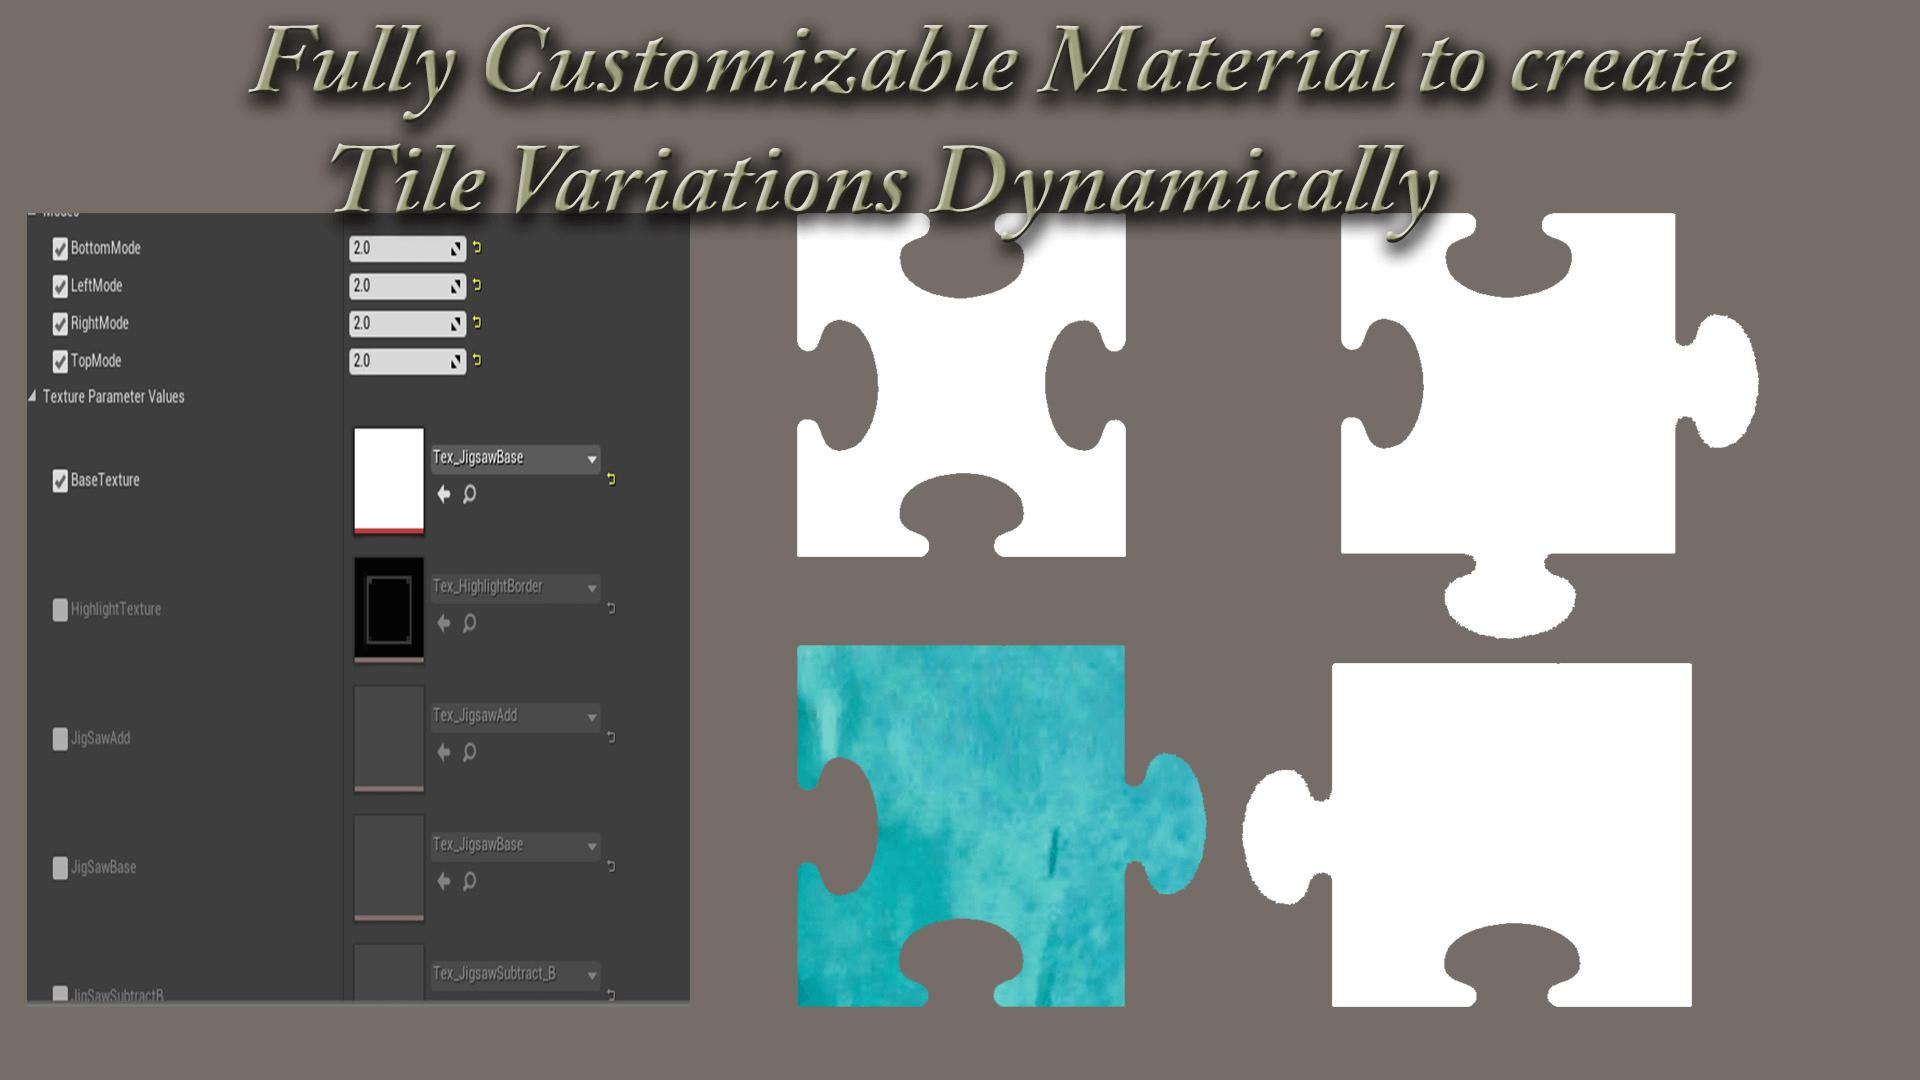 jigsaw puzzle template by sameek kundu in blueprints ue4 marketplace